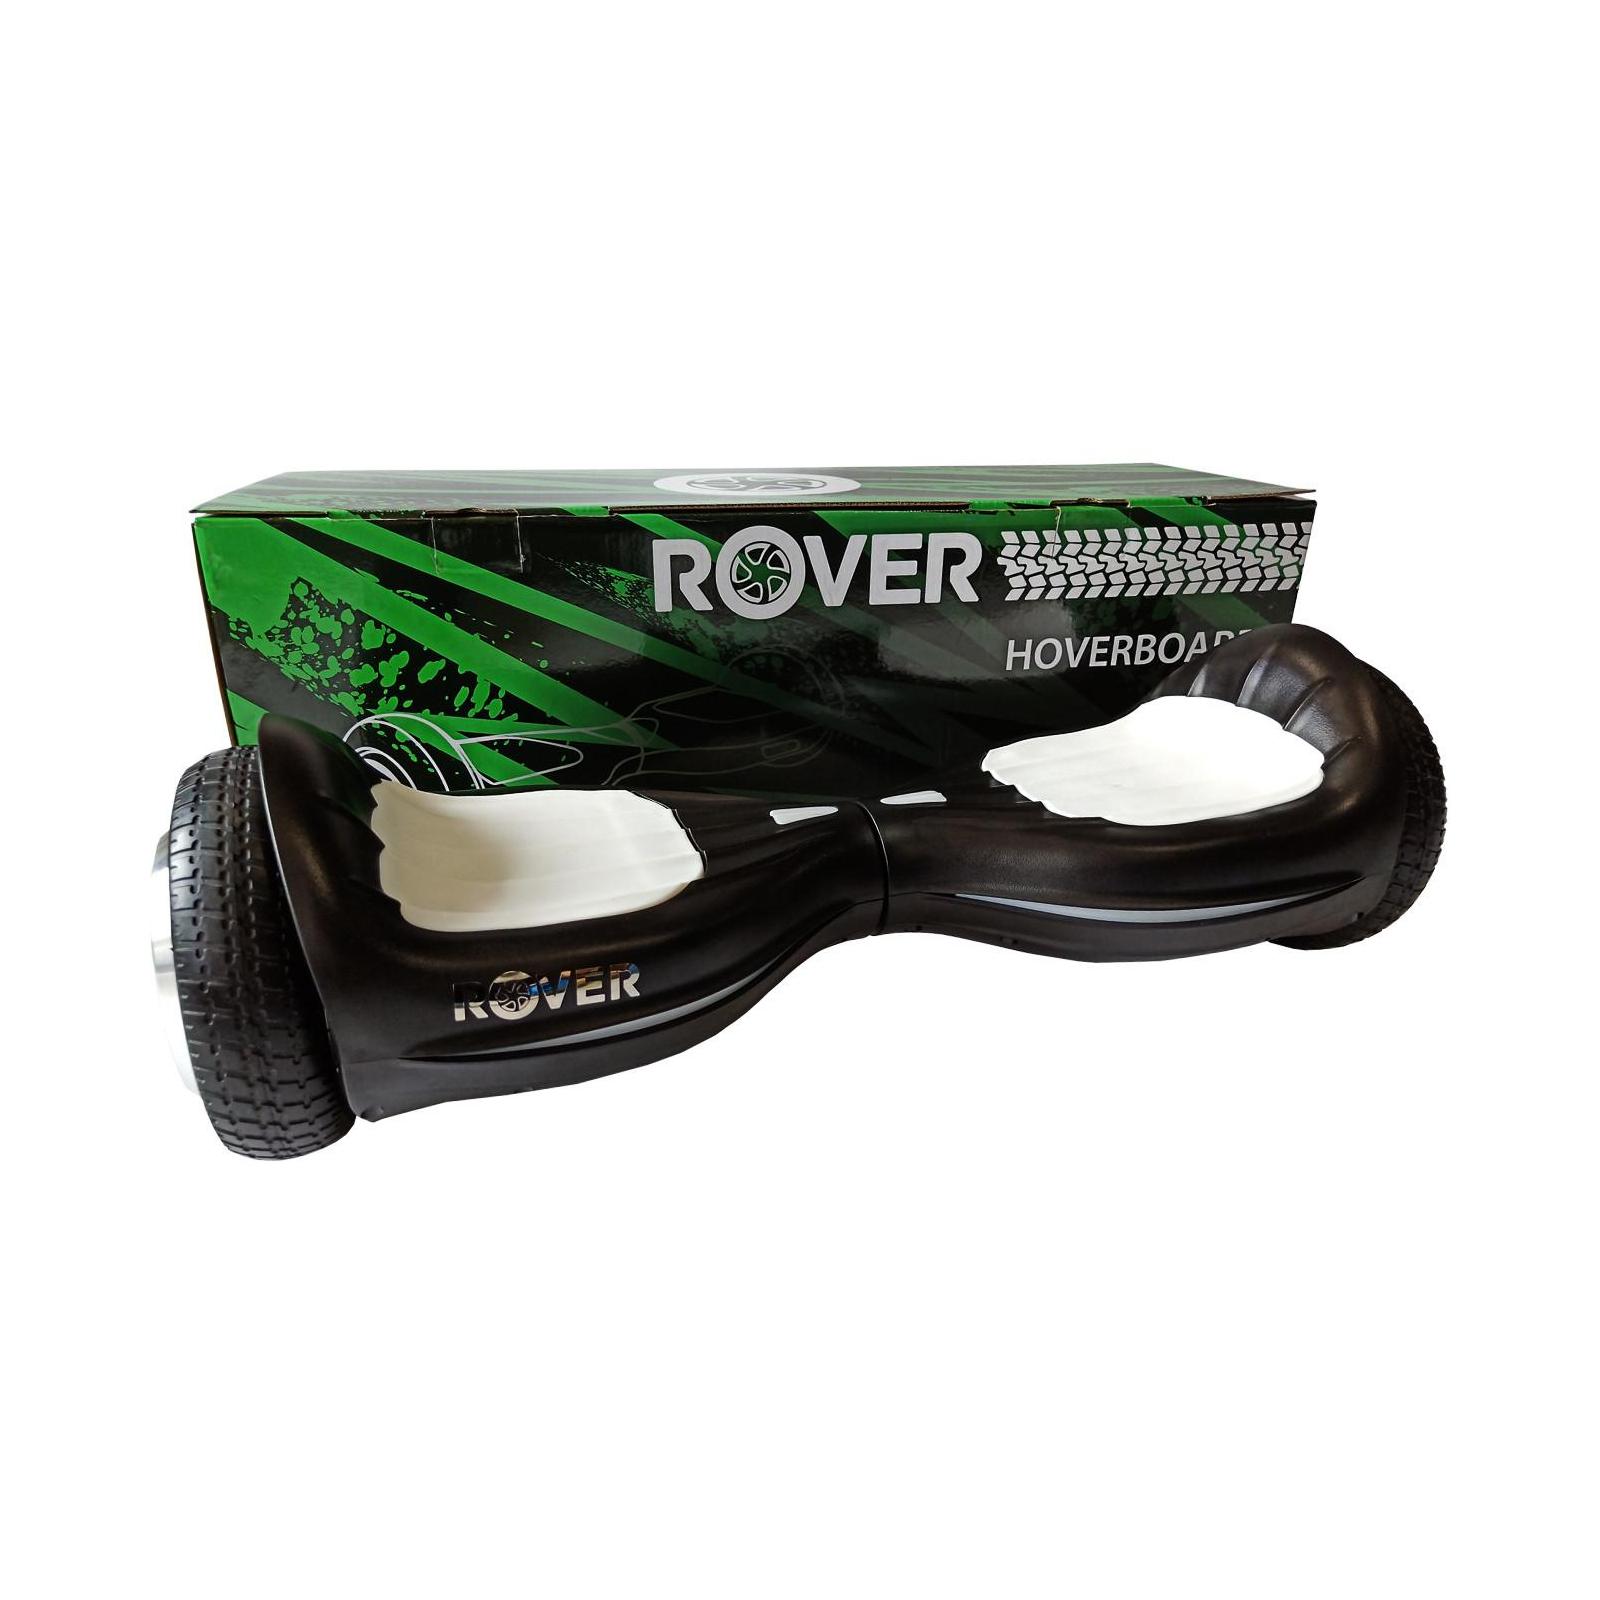 Гироборд Rover M6 6.5 black изображение 6